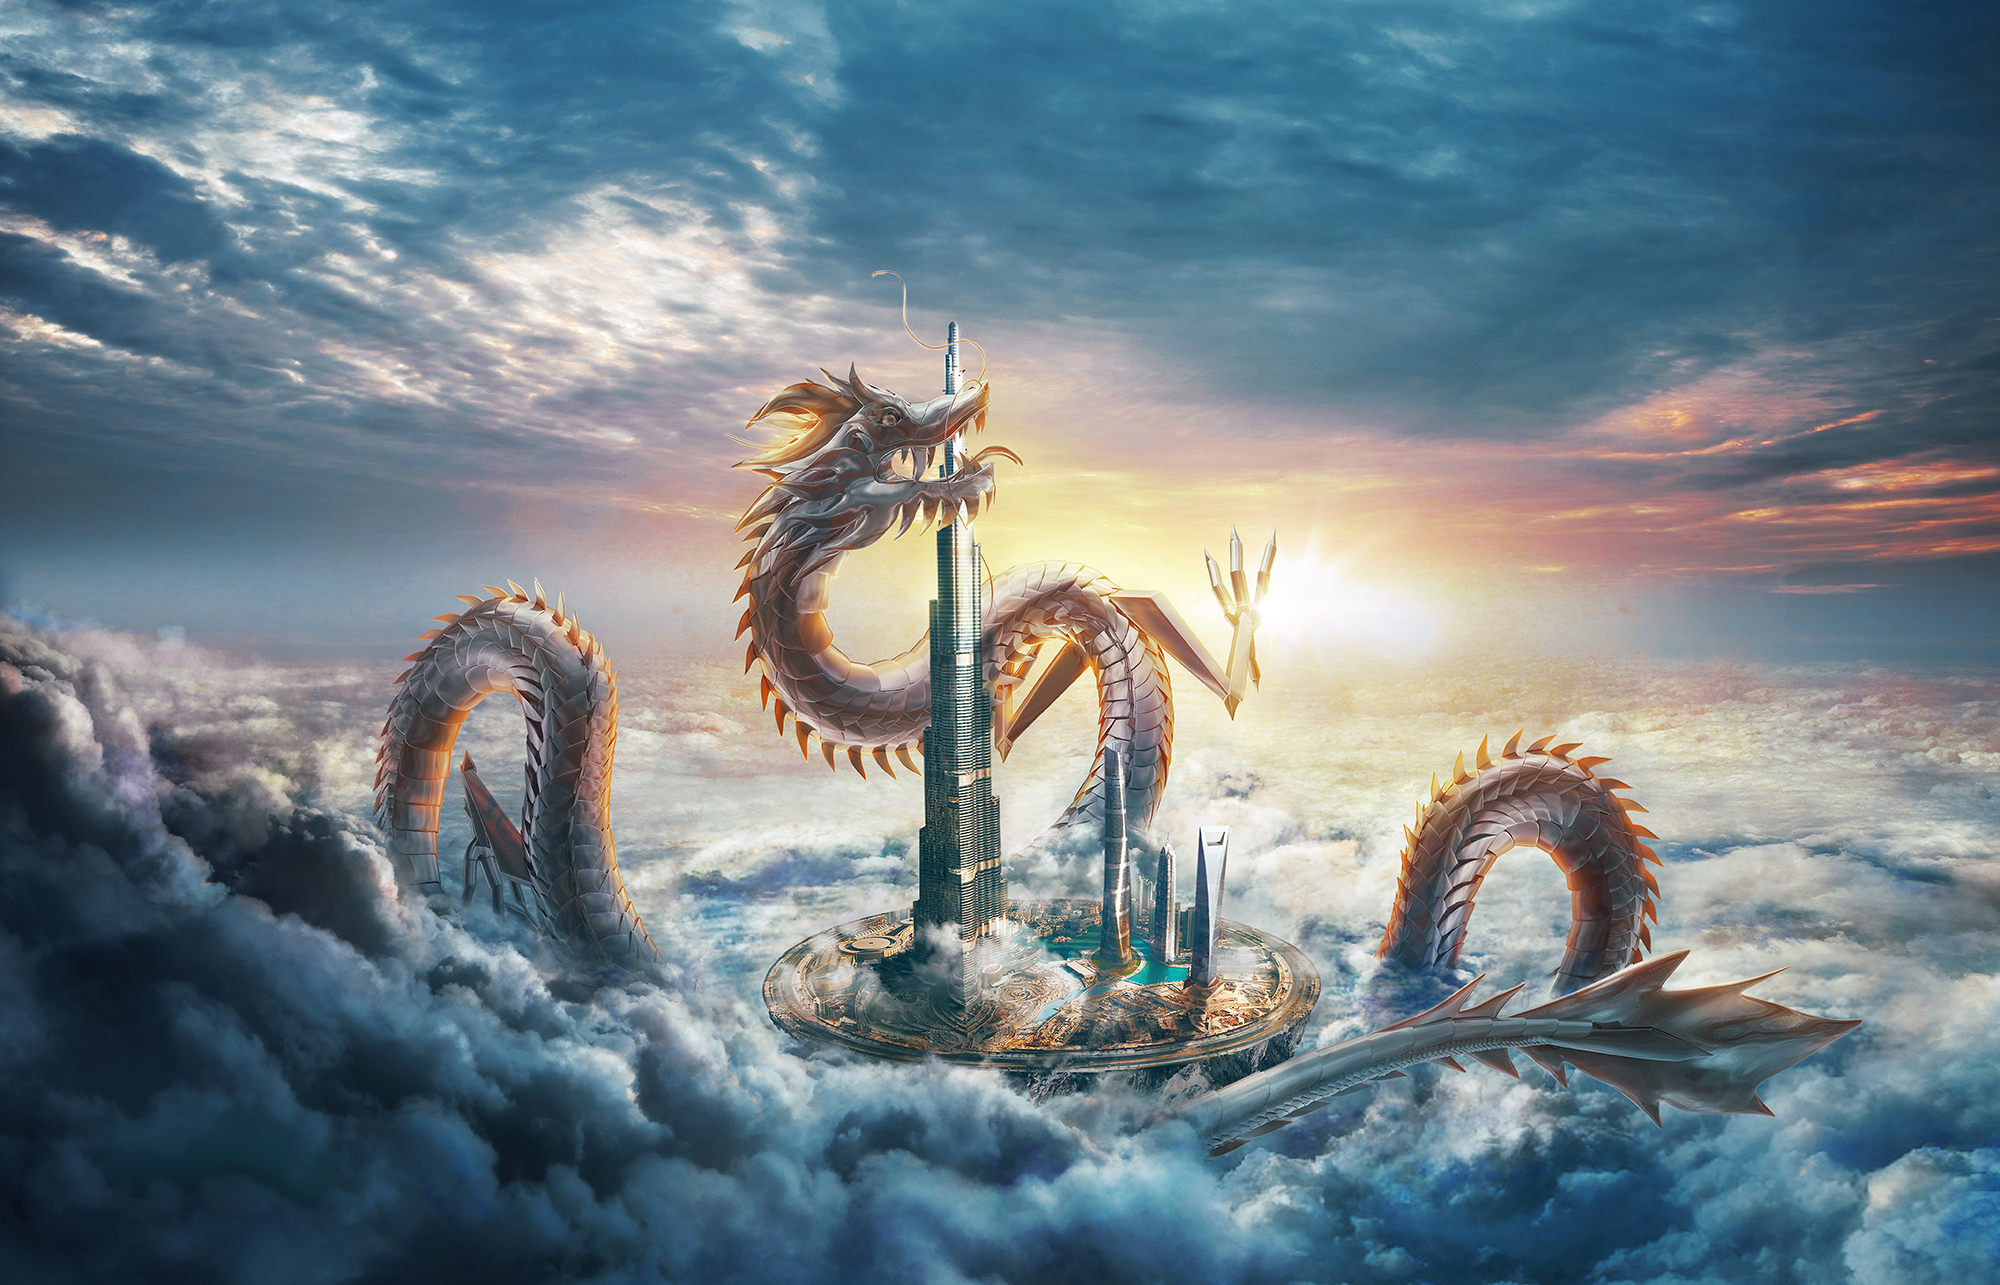 dragon vietnam-rong vietnam- digital imaging-photomanipulation-bratus agency vietnam